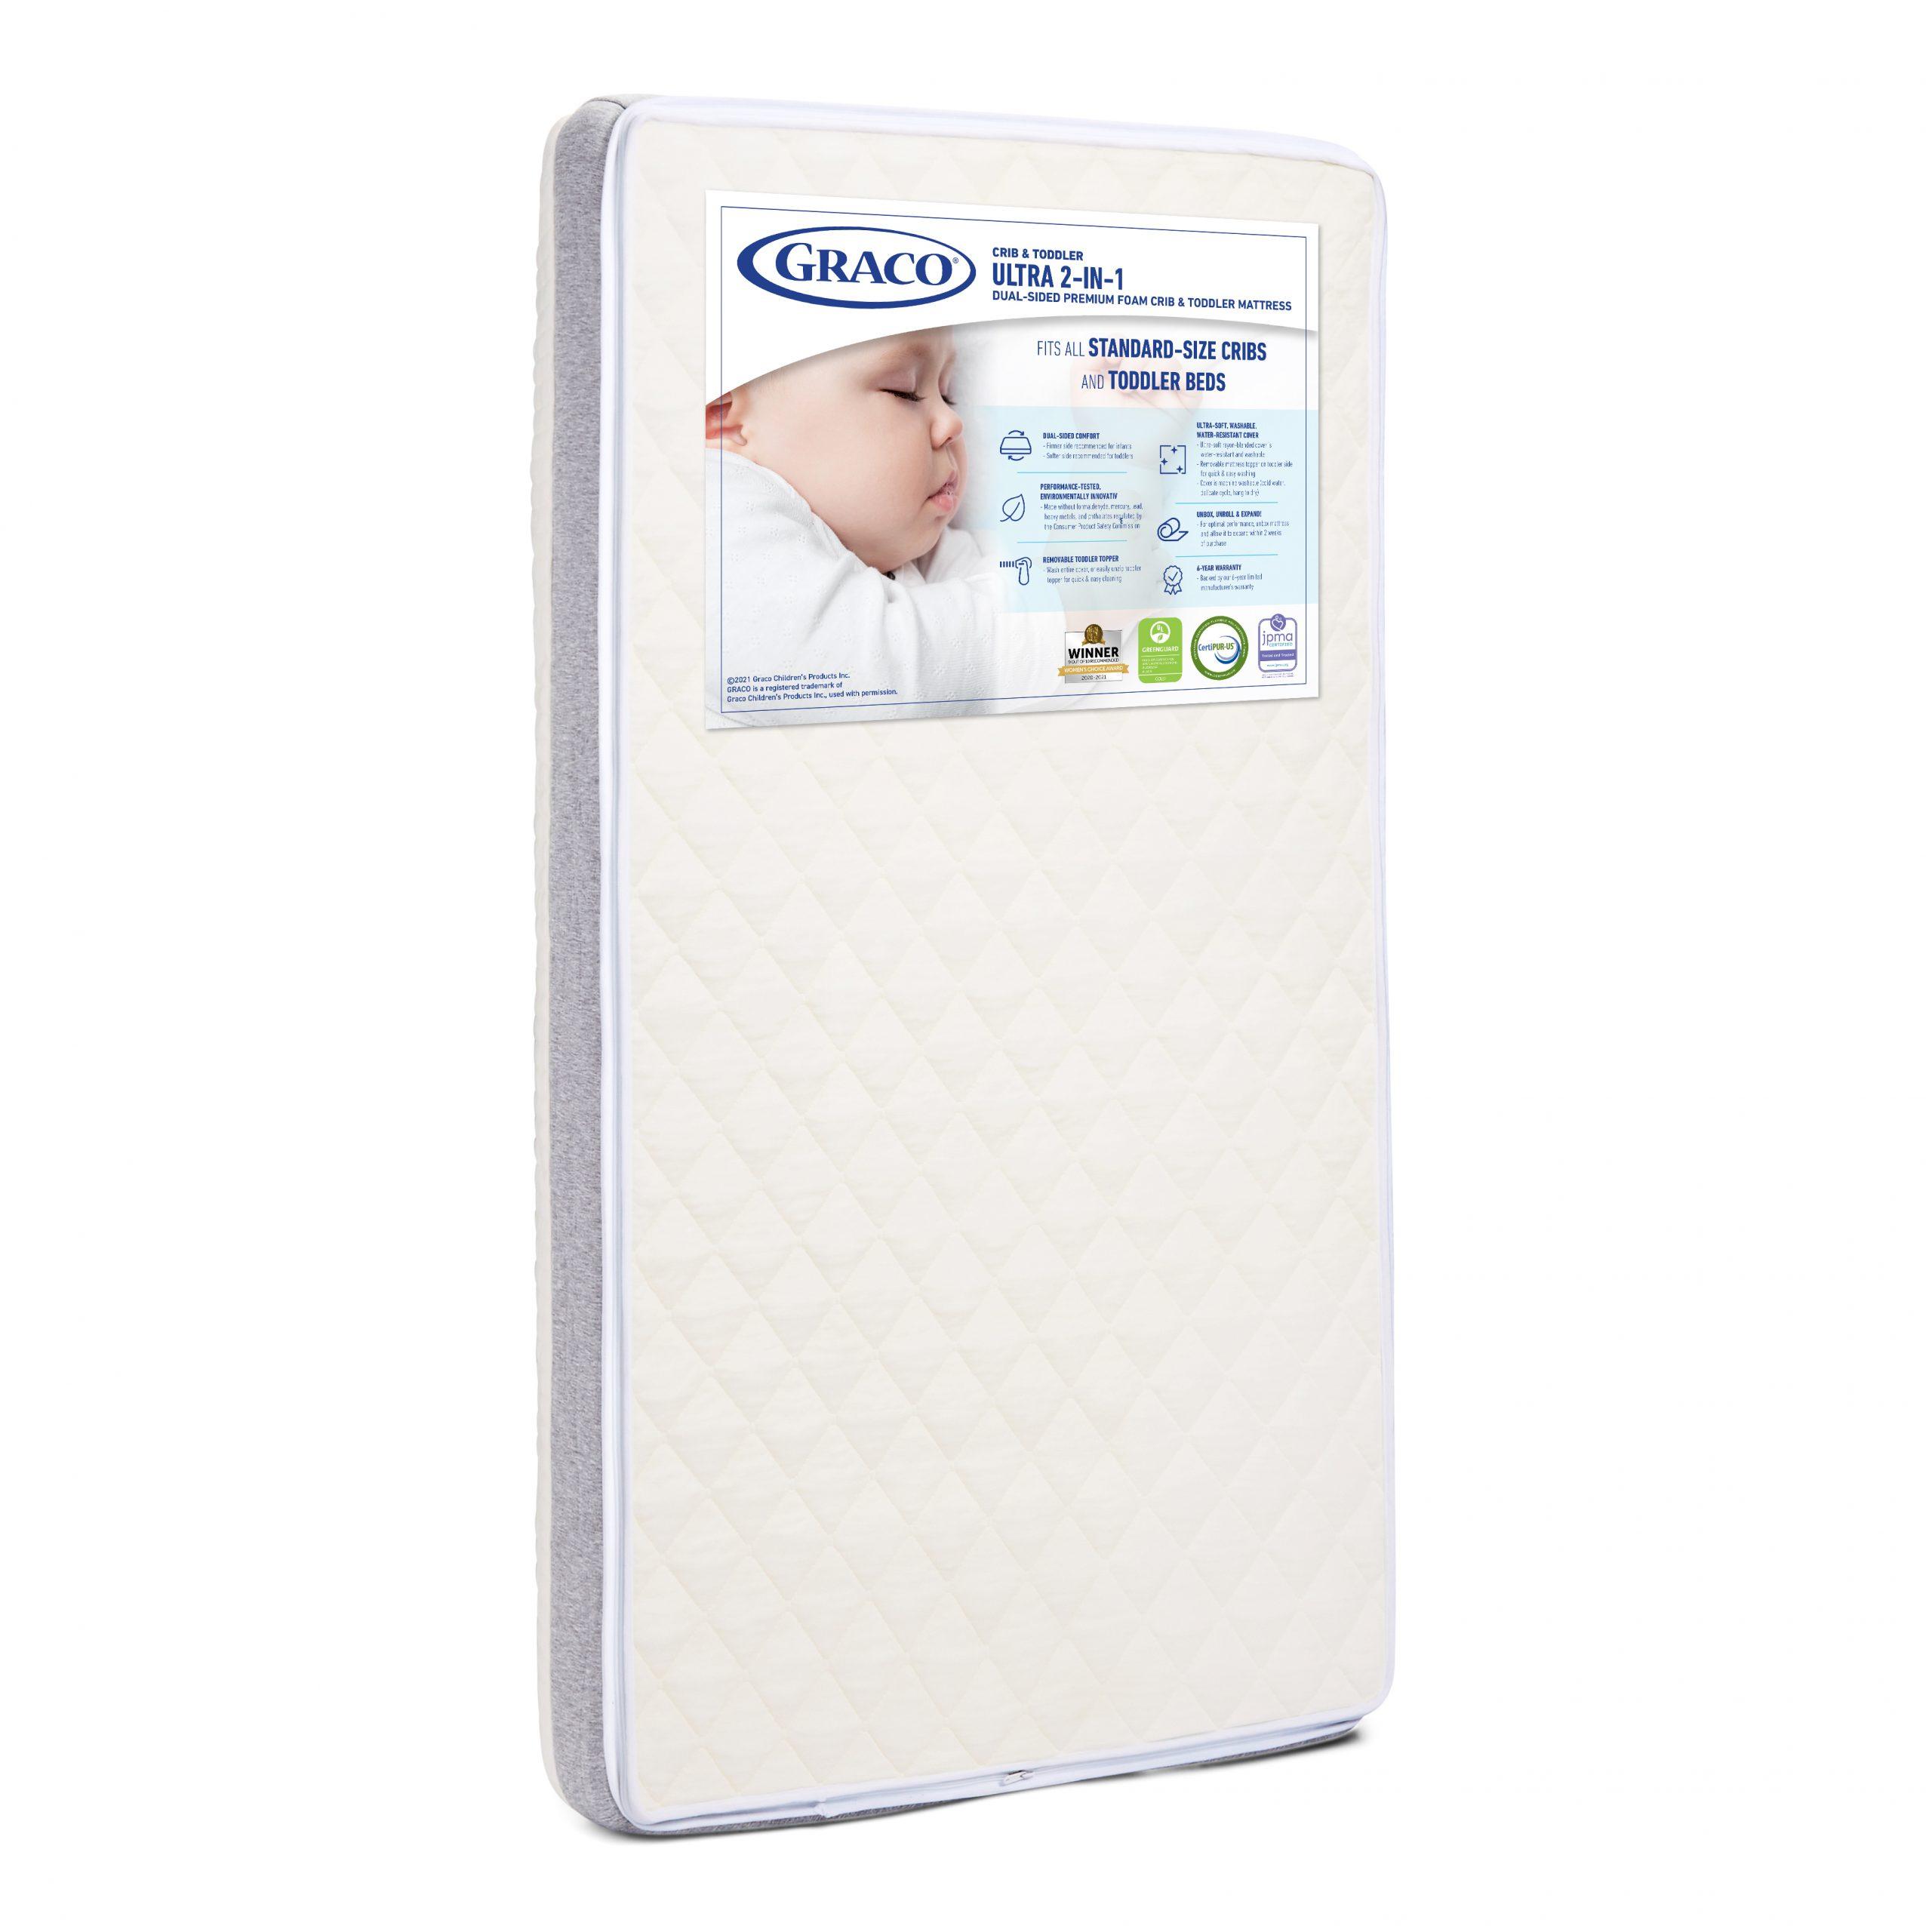 Graco Ultra Premium 2-in-1 Crib and Toddler Mattress